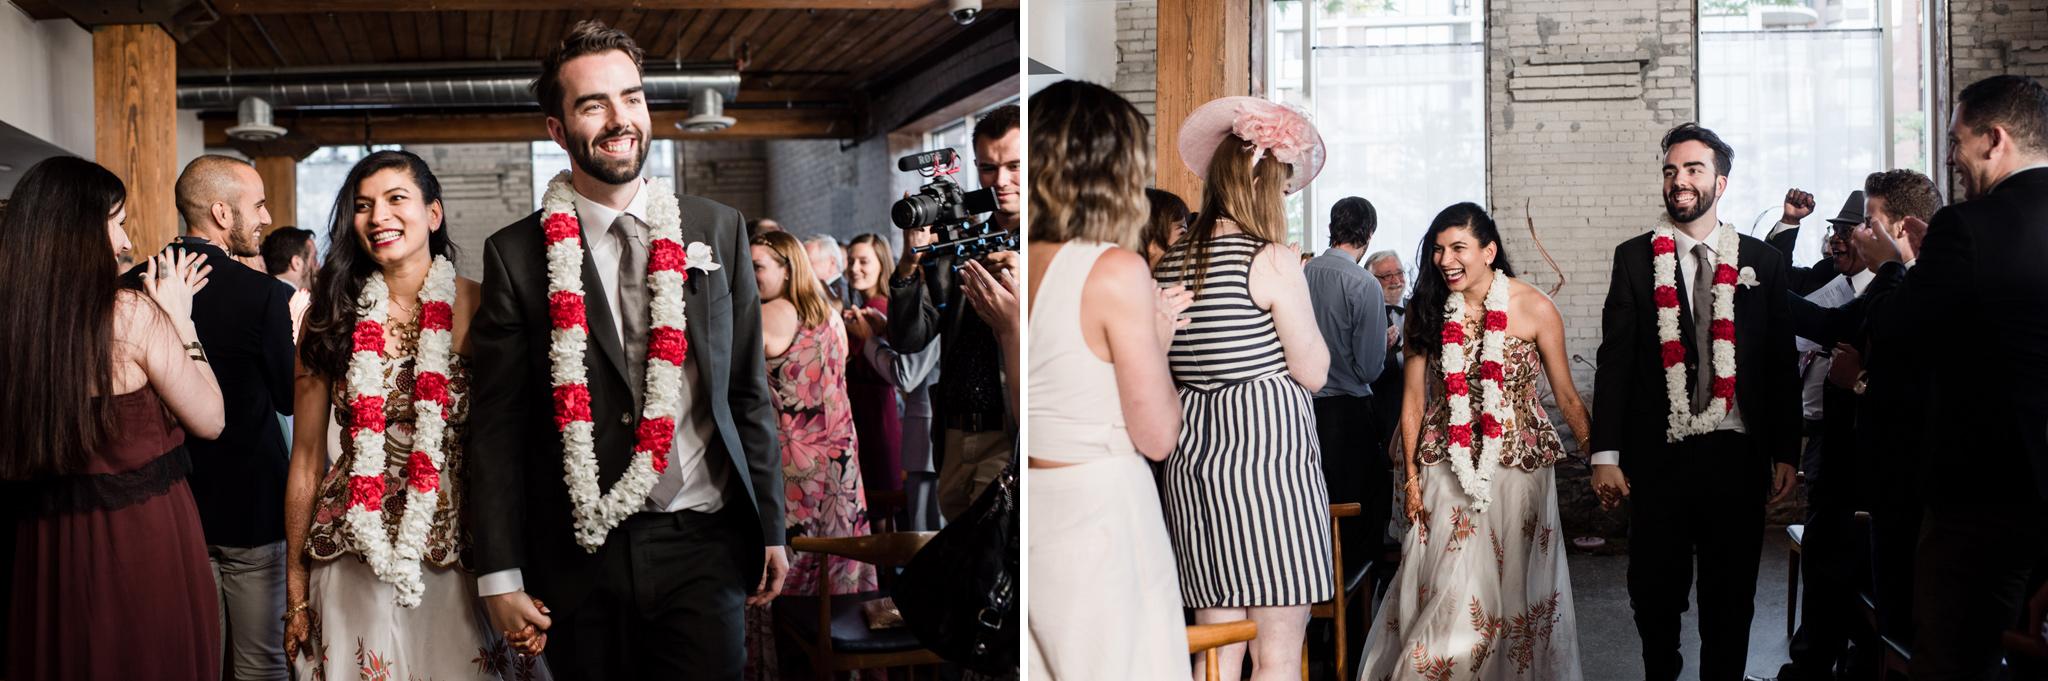 065-wedding-ceremony-reception-recessional-bride-groom-exit-photographer.jpg